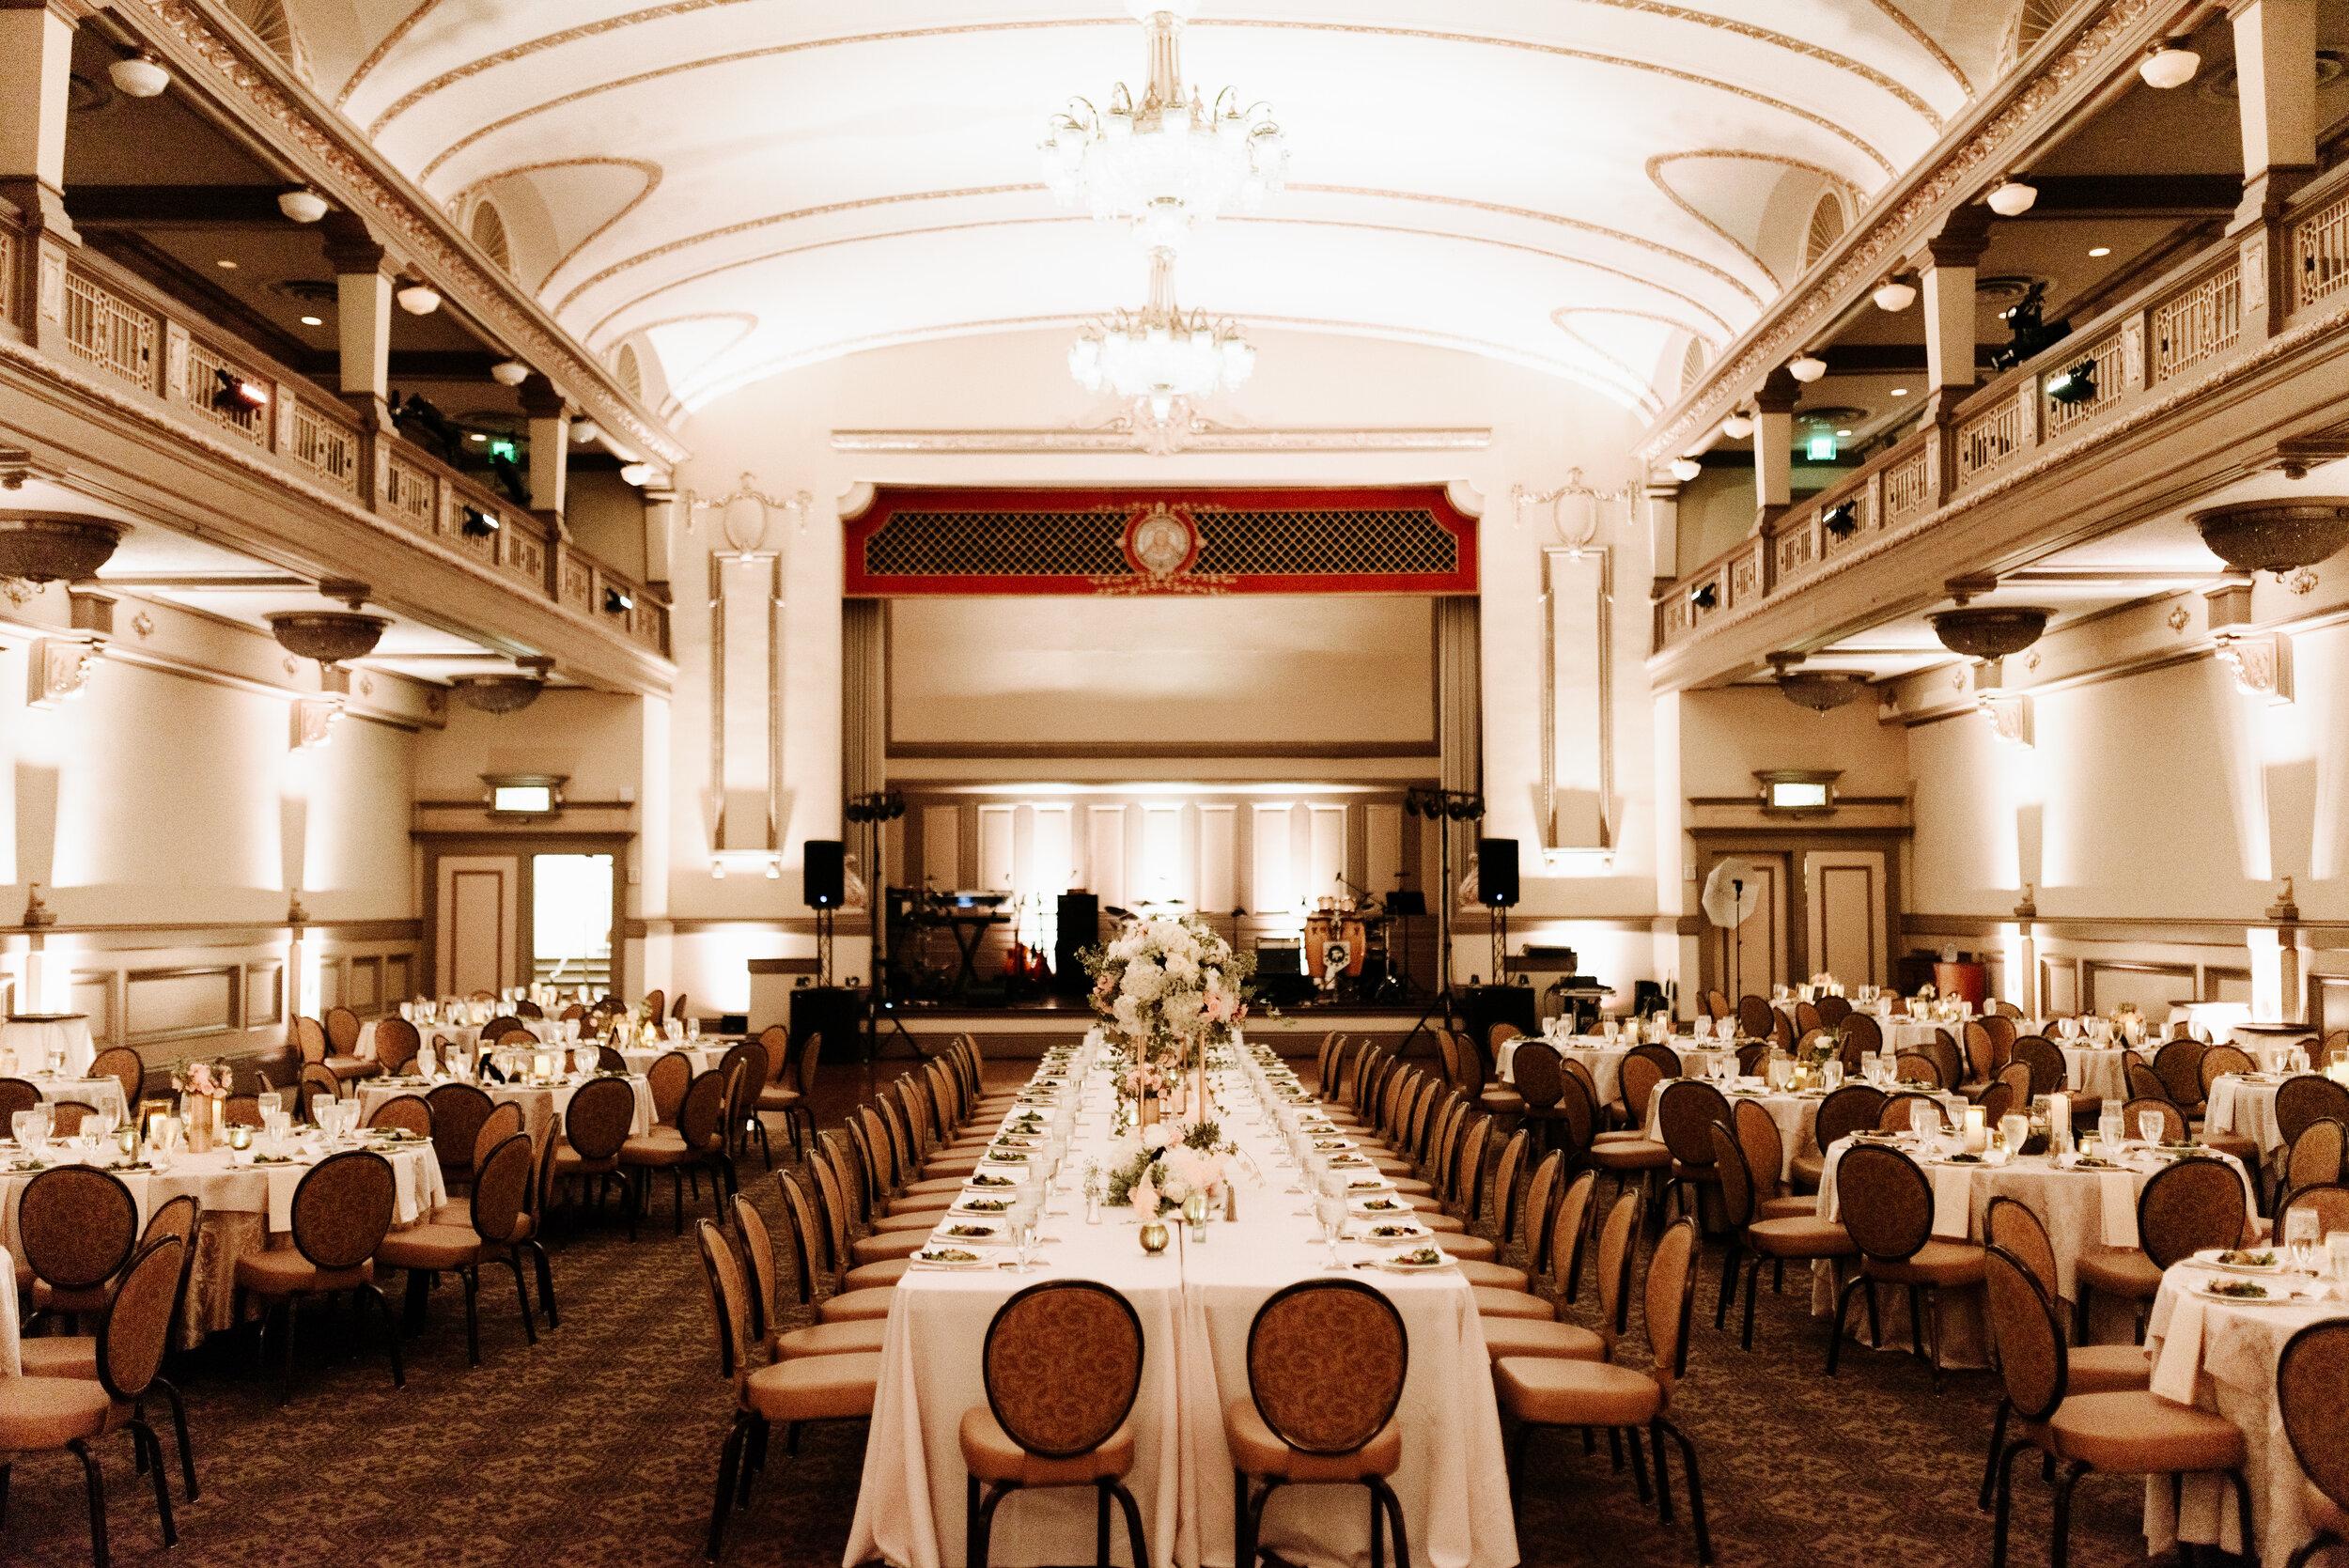 Cassie-Mrunal-Wedding-Quirk-Hotel-John-Marshall-Ballrooms-Richmond-Virginia-Photography-by-V-88.jpg